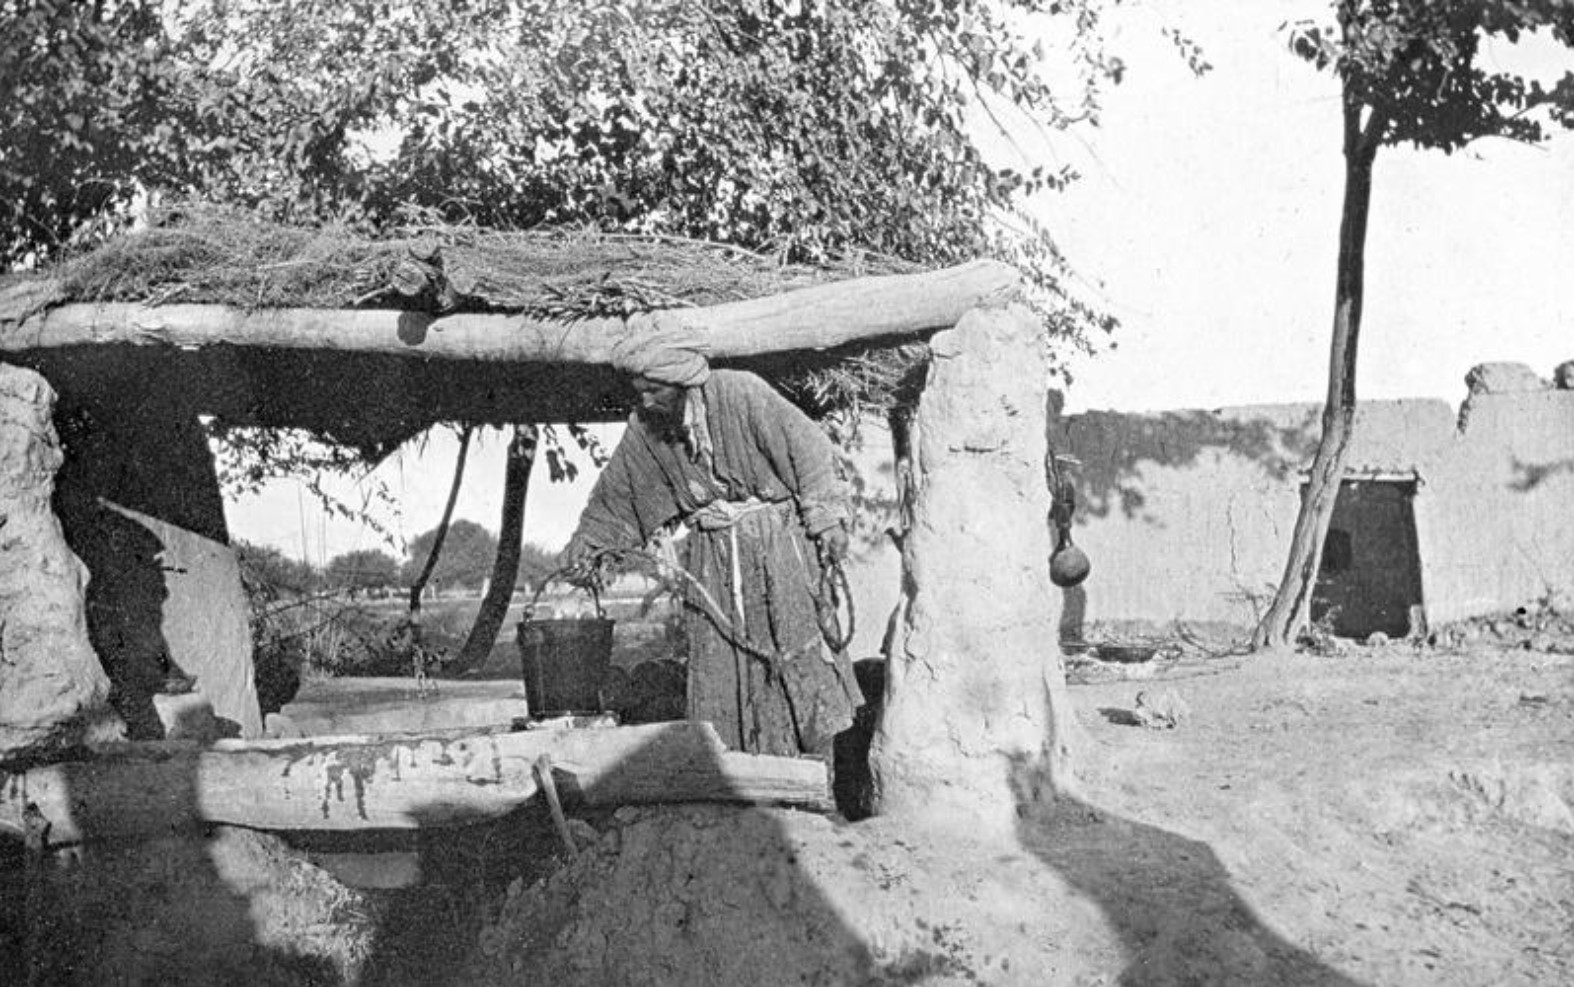 Окрестности Самарканда. Туркмен рядом с колодцем